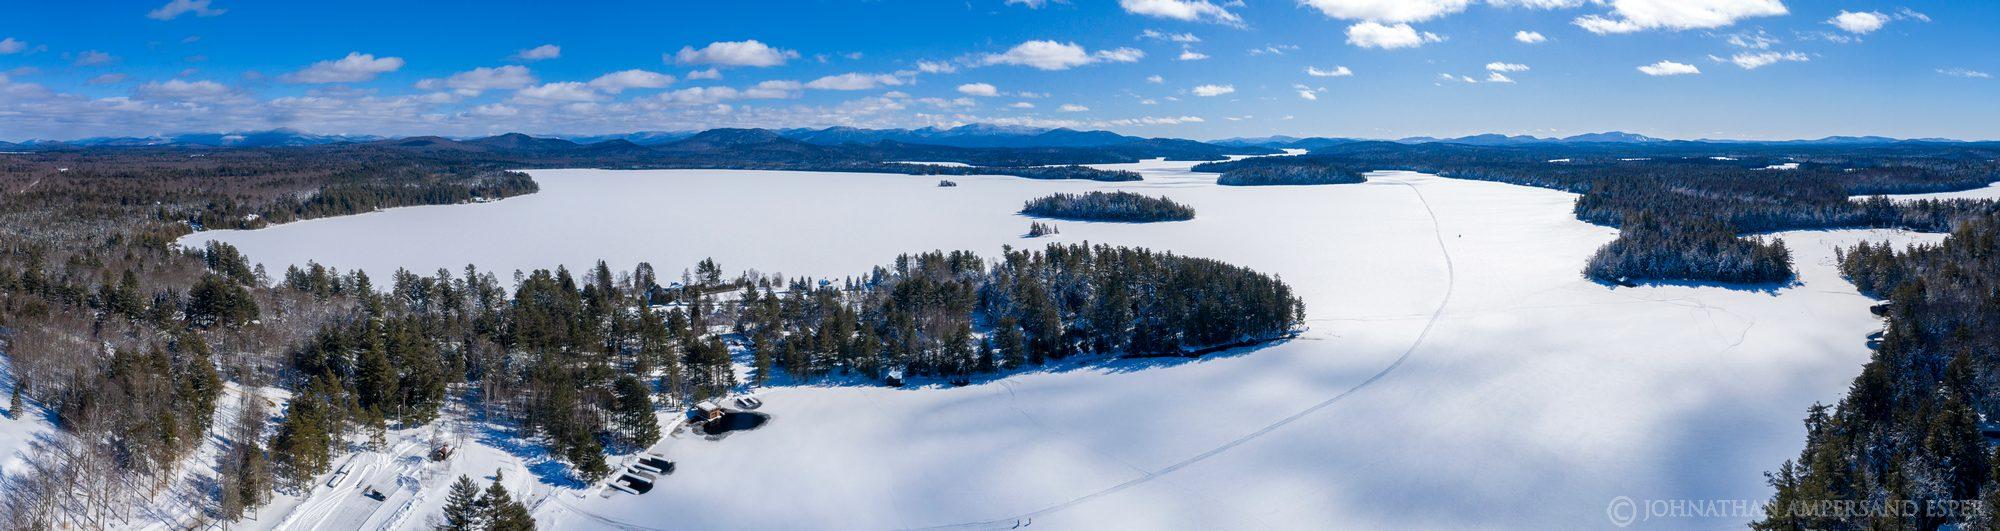 Upper Saranac Lake,winter,late winter,March,2020,sunny,drone,panorama,360 degree panorama,Saranac Lakes, photo